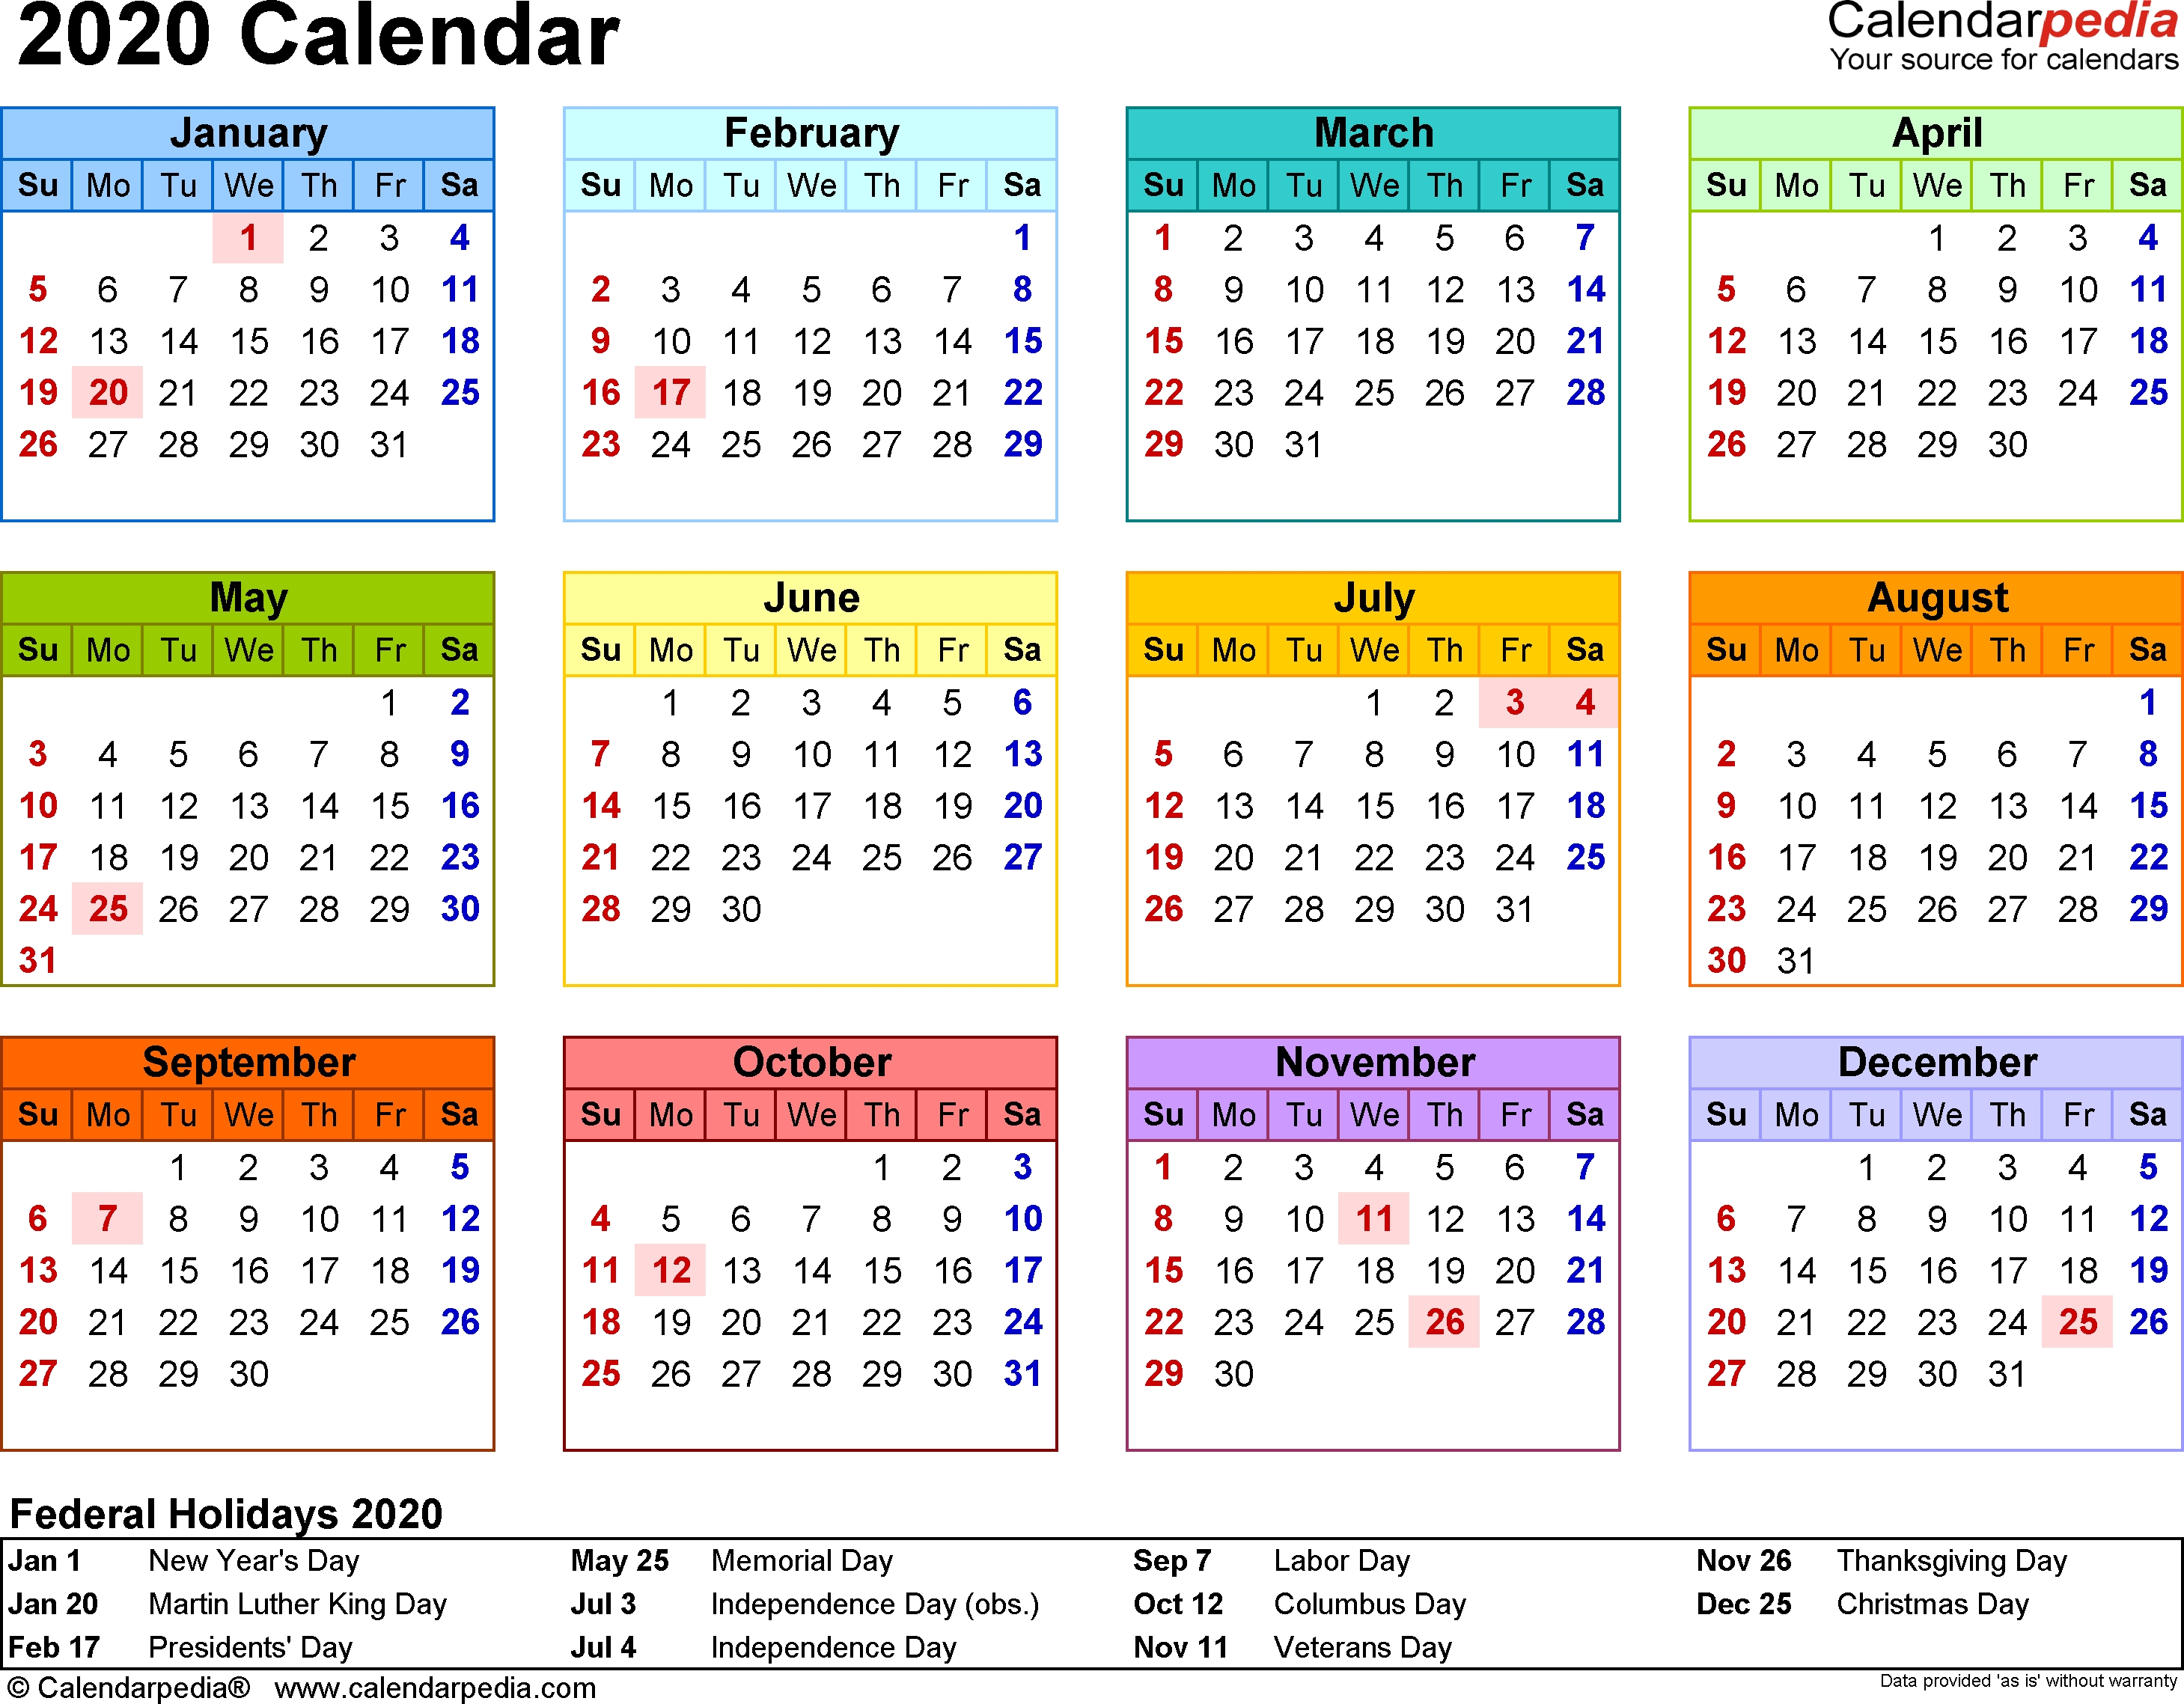 2020 Calendar - Download 17 Free Printable Excel Templates (.xlsx) Perky 2020 Calendar School Holidays